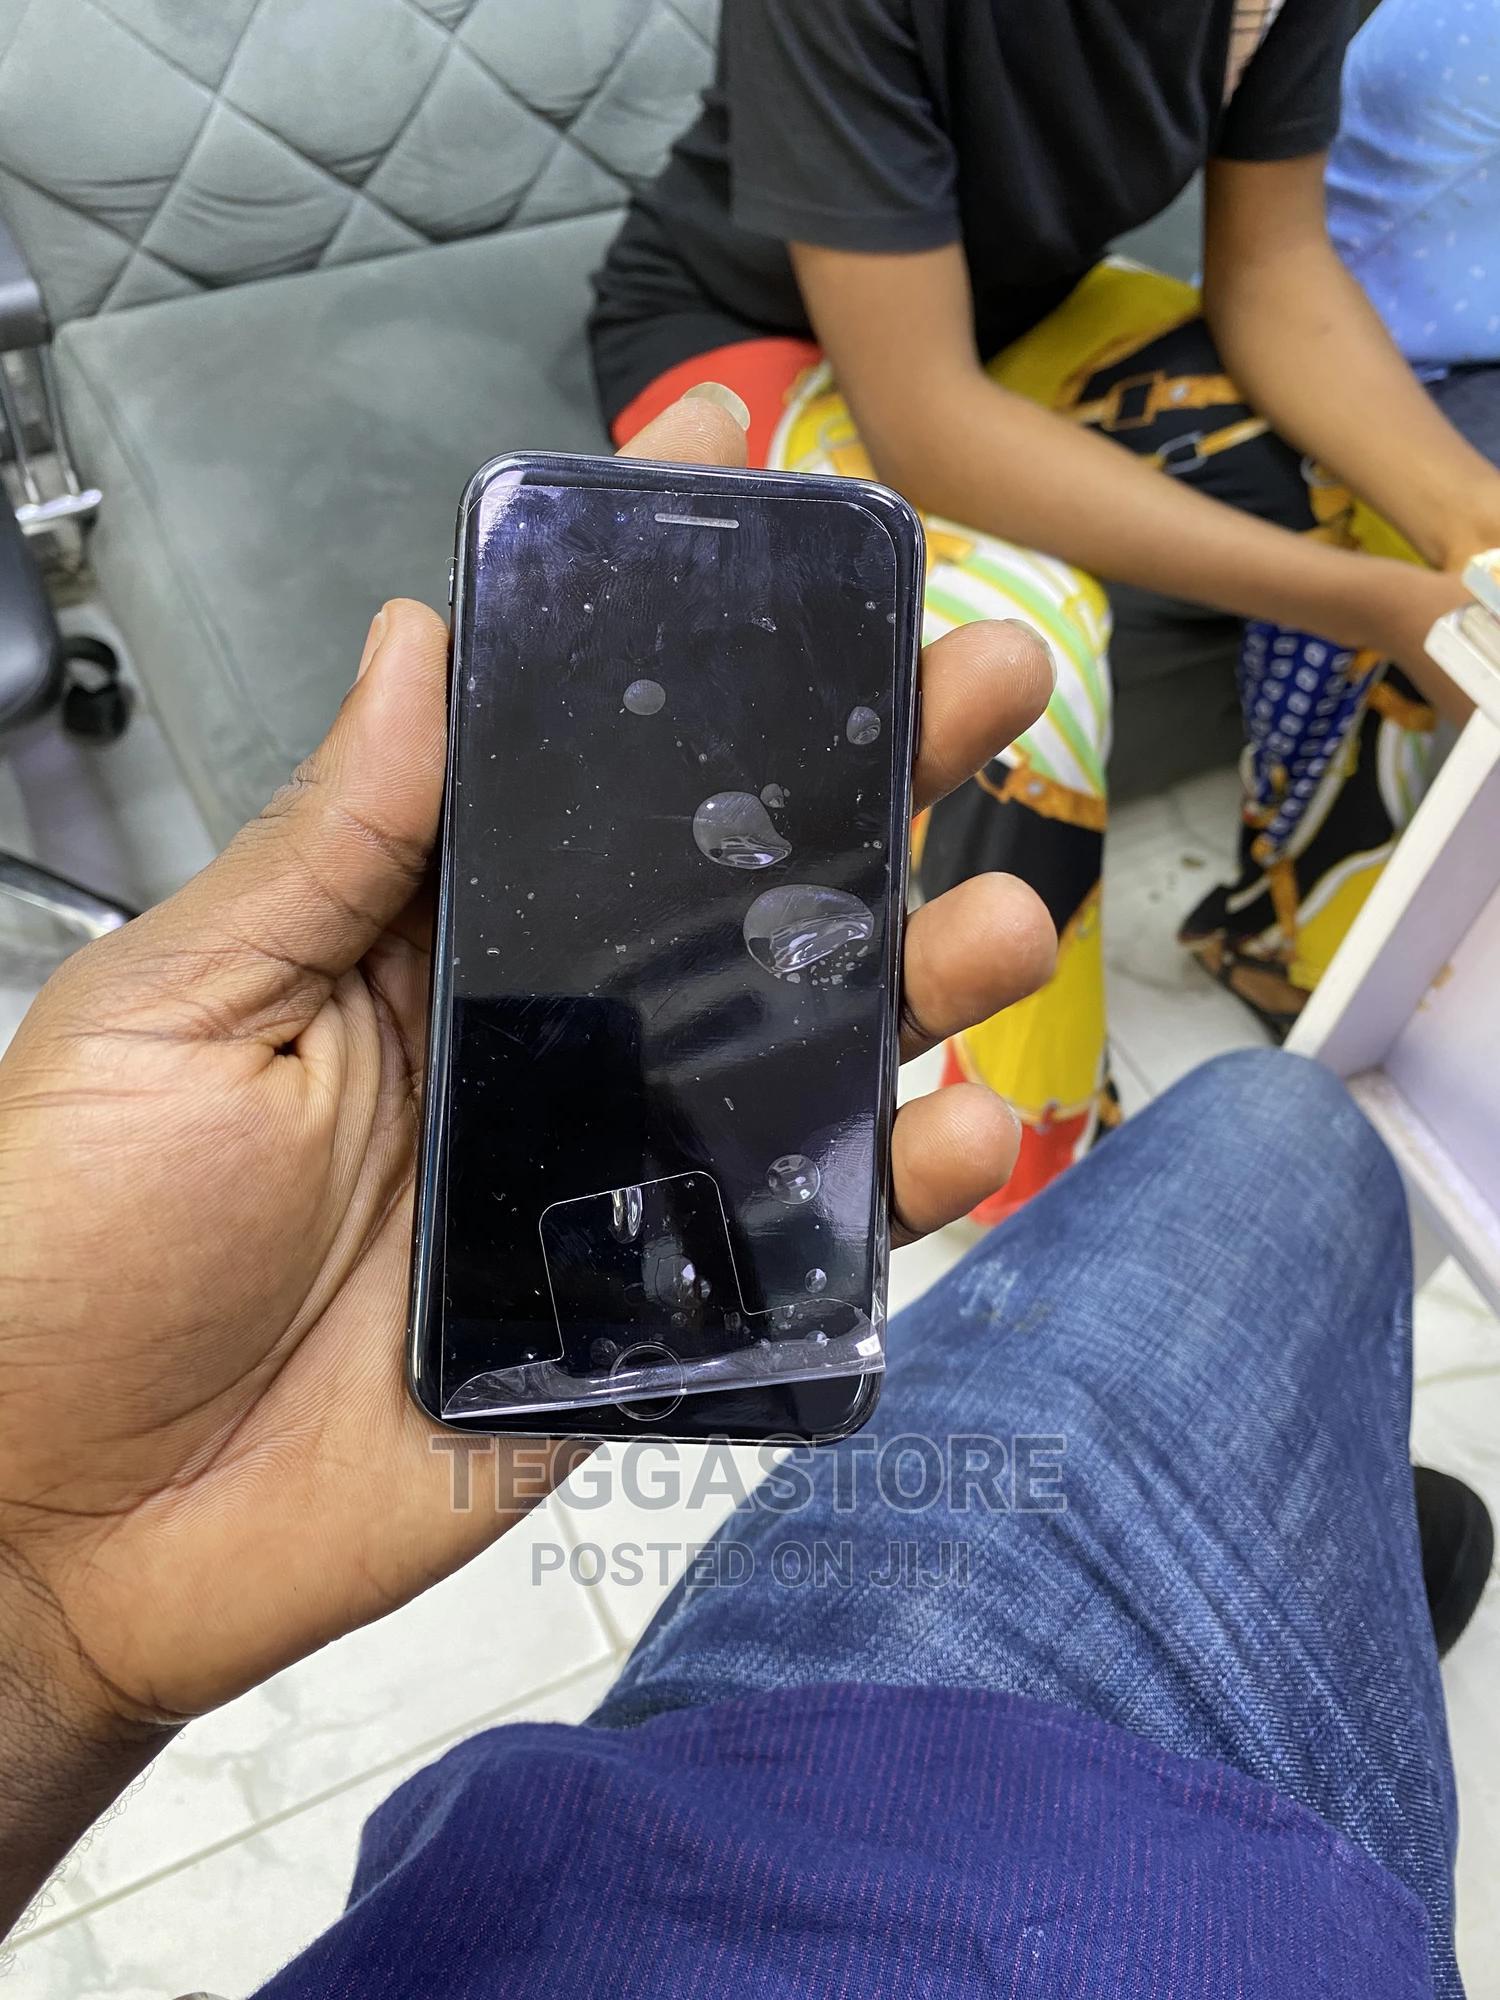 Apple iPhone 7 128 GB Black | Mobile Phones for sale in Ikeja, Lagos State, Nigeria